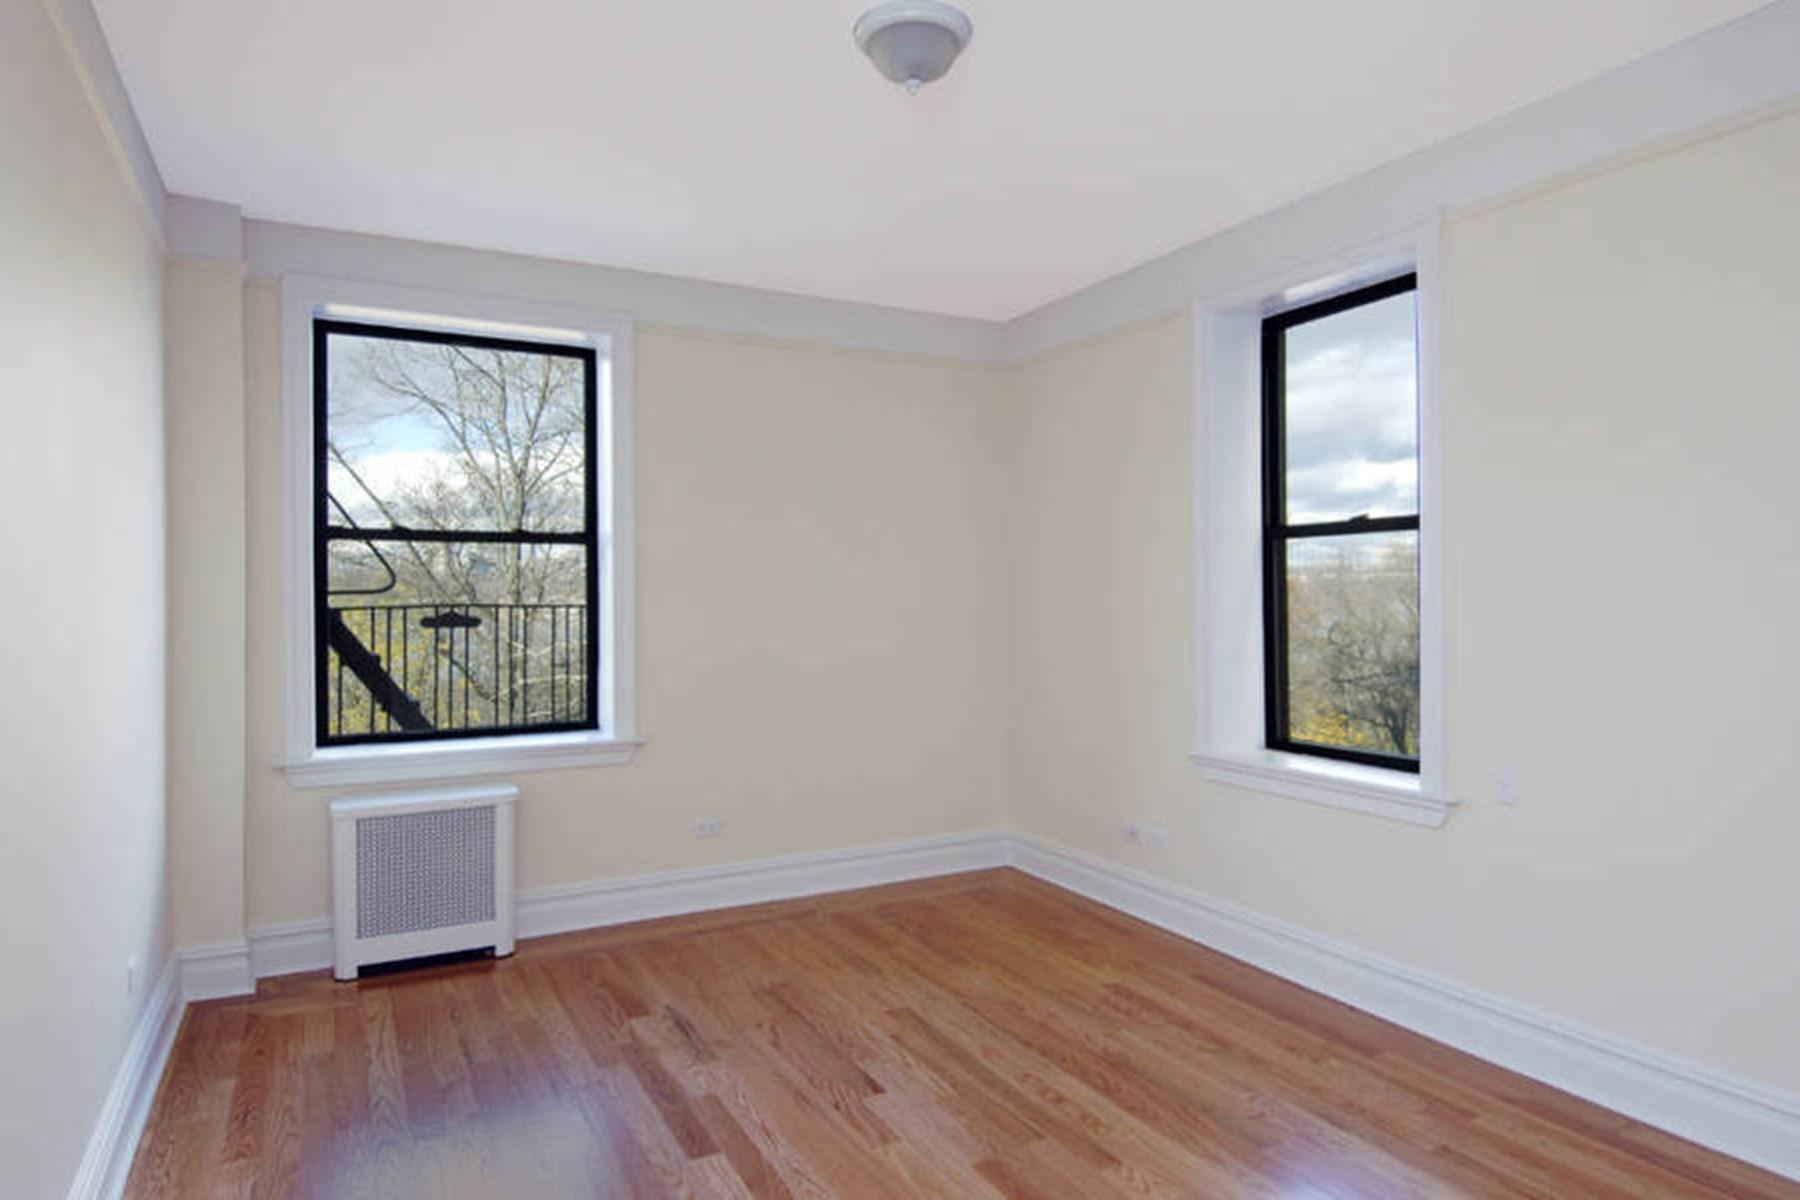 Property Of 700 Riverside Drive, Apt 4E